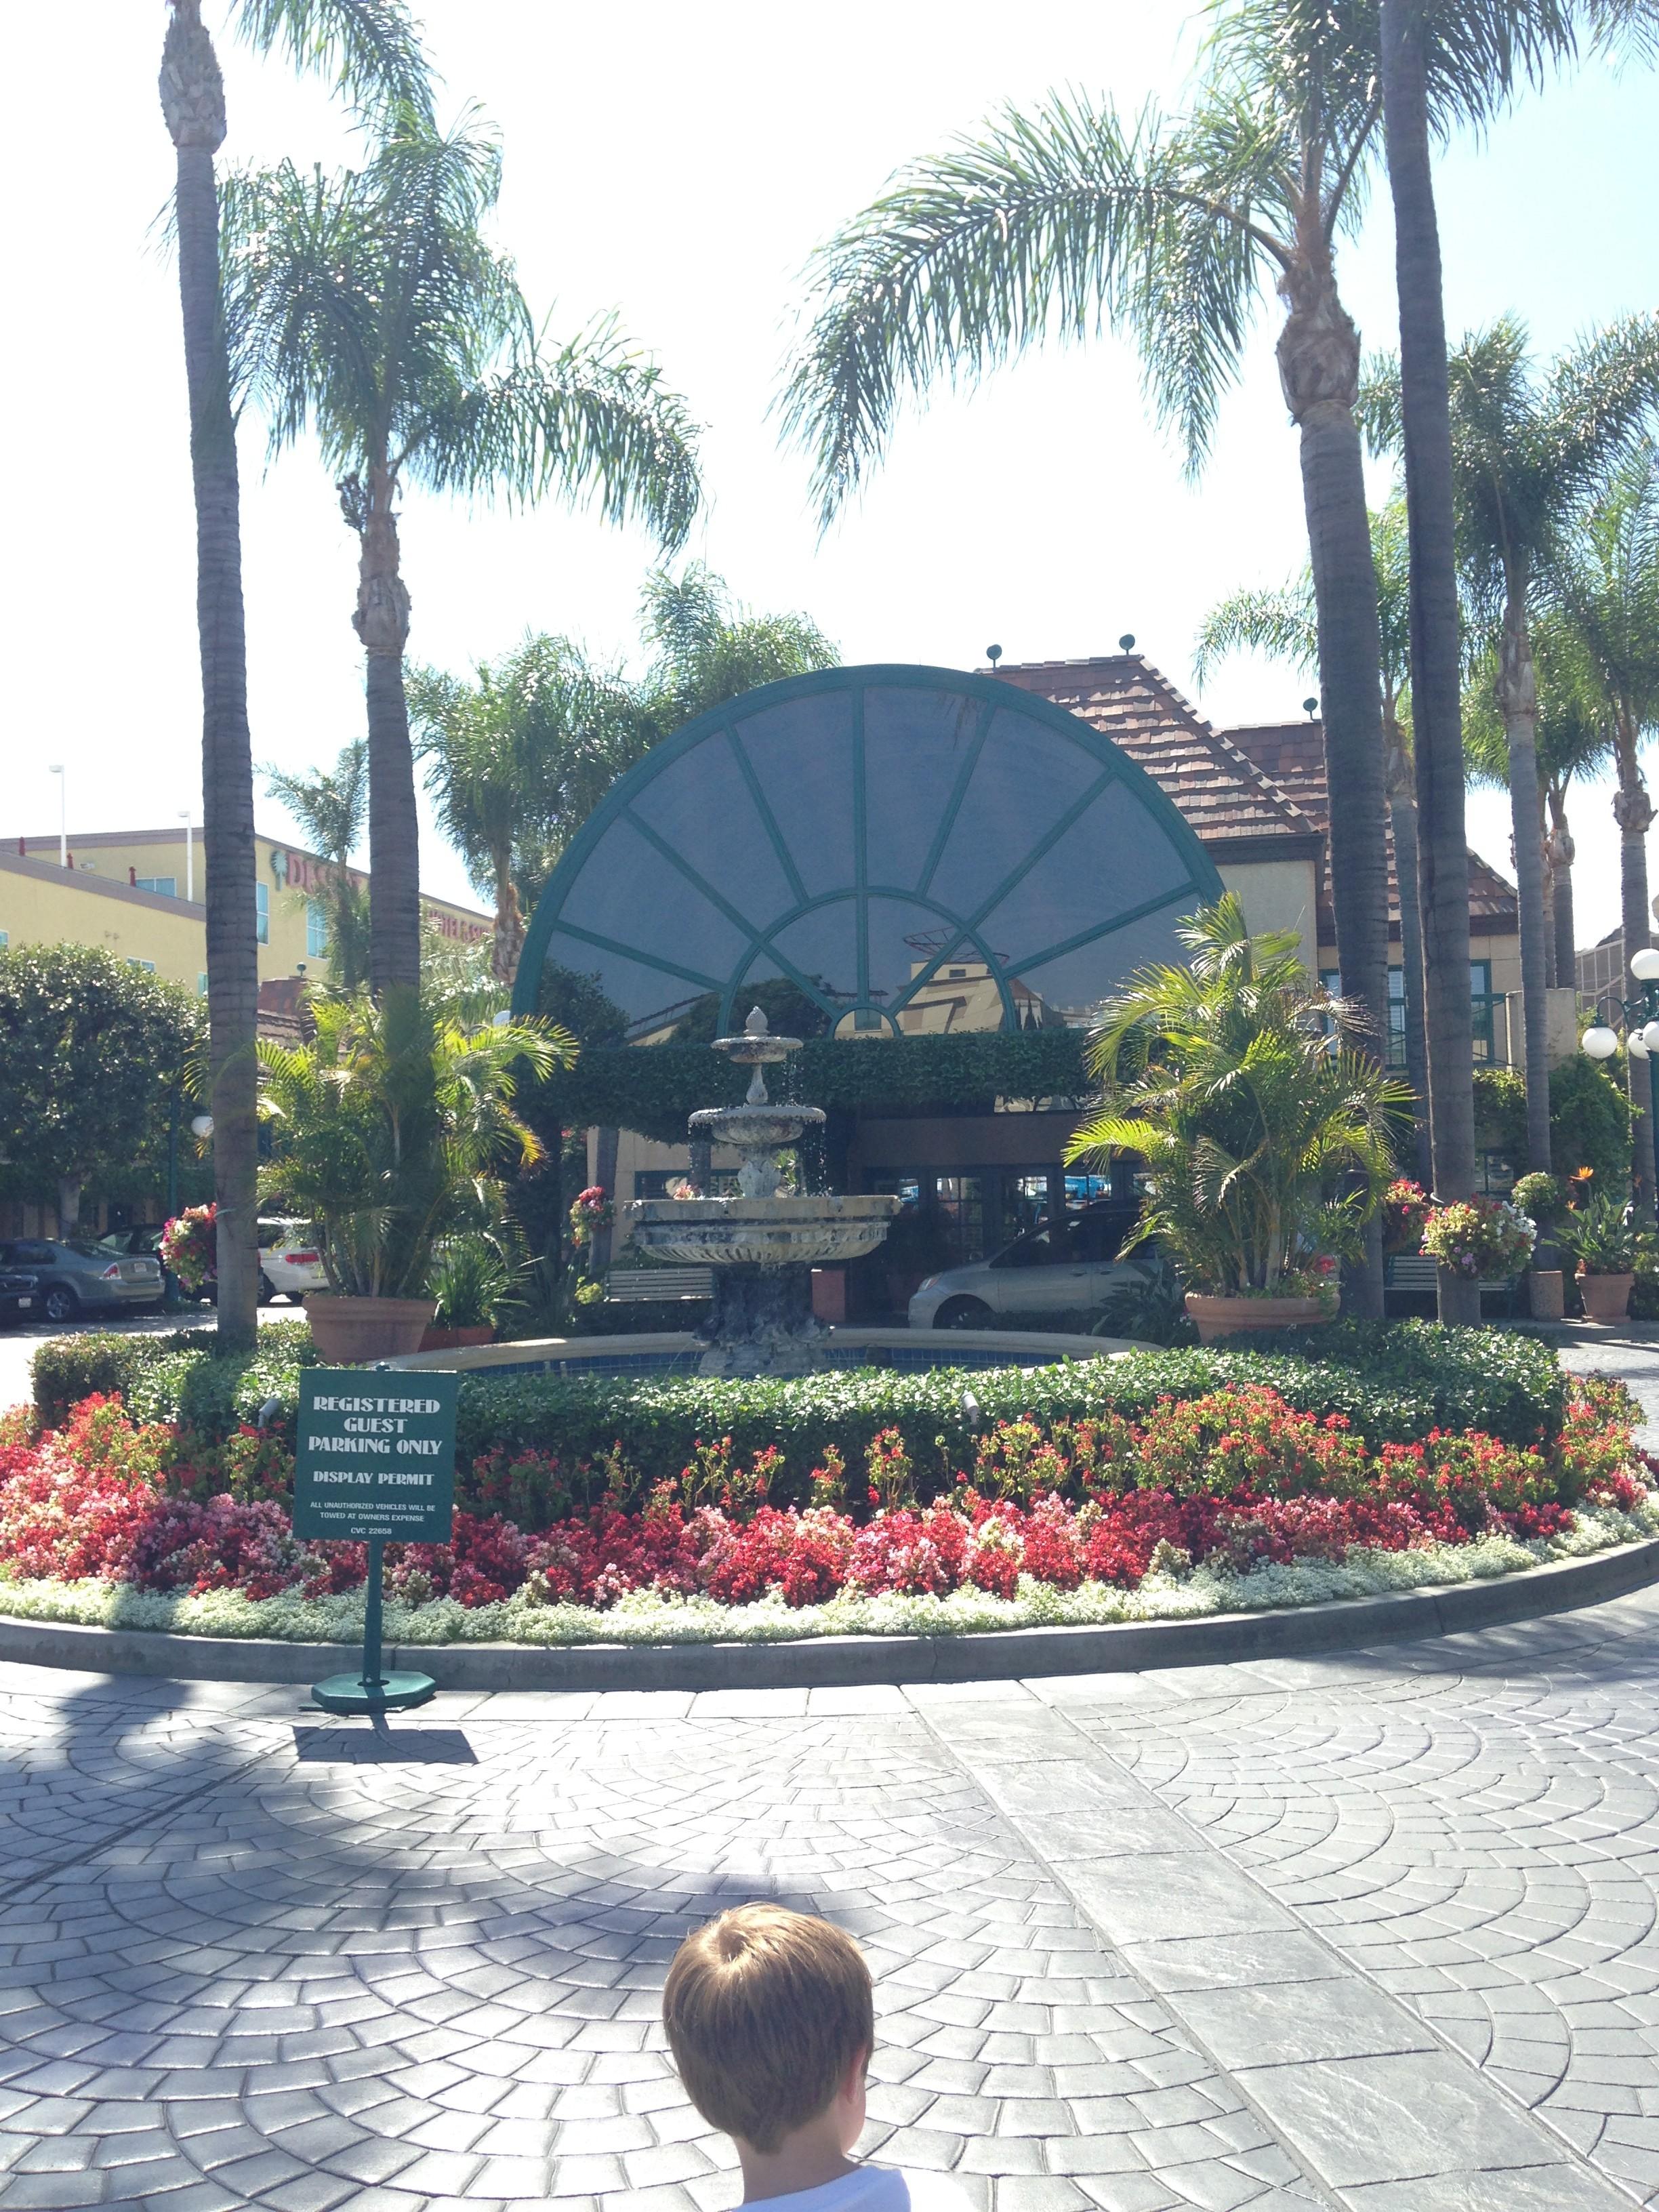 The Candy Cane Inn: Disneyland's BEST Good Neighbor Hotel